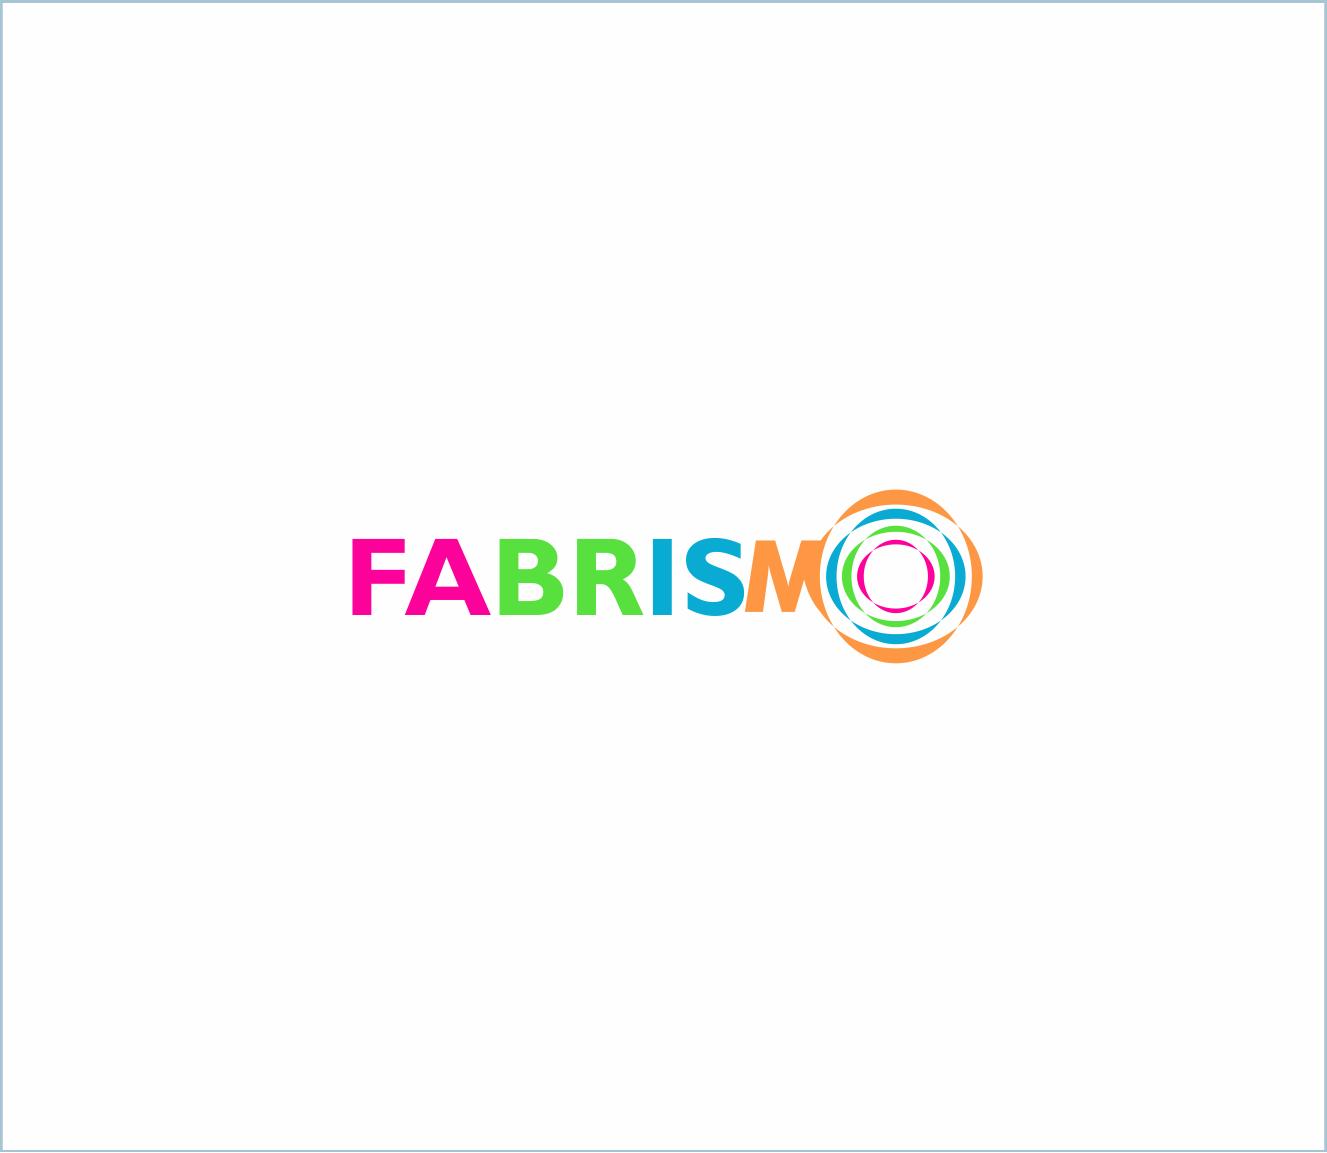 Logo Design by Armada Jamaluddin - Entry No. 25 in the Logo Design Contest Imaginative Logo Design for Fabrismo.